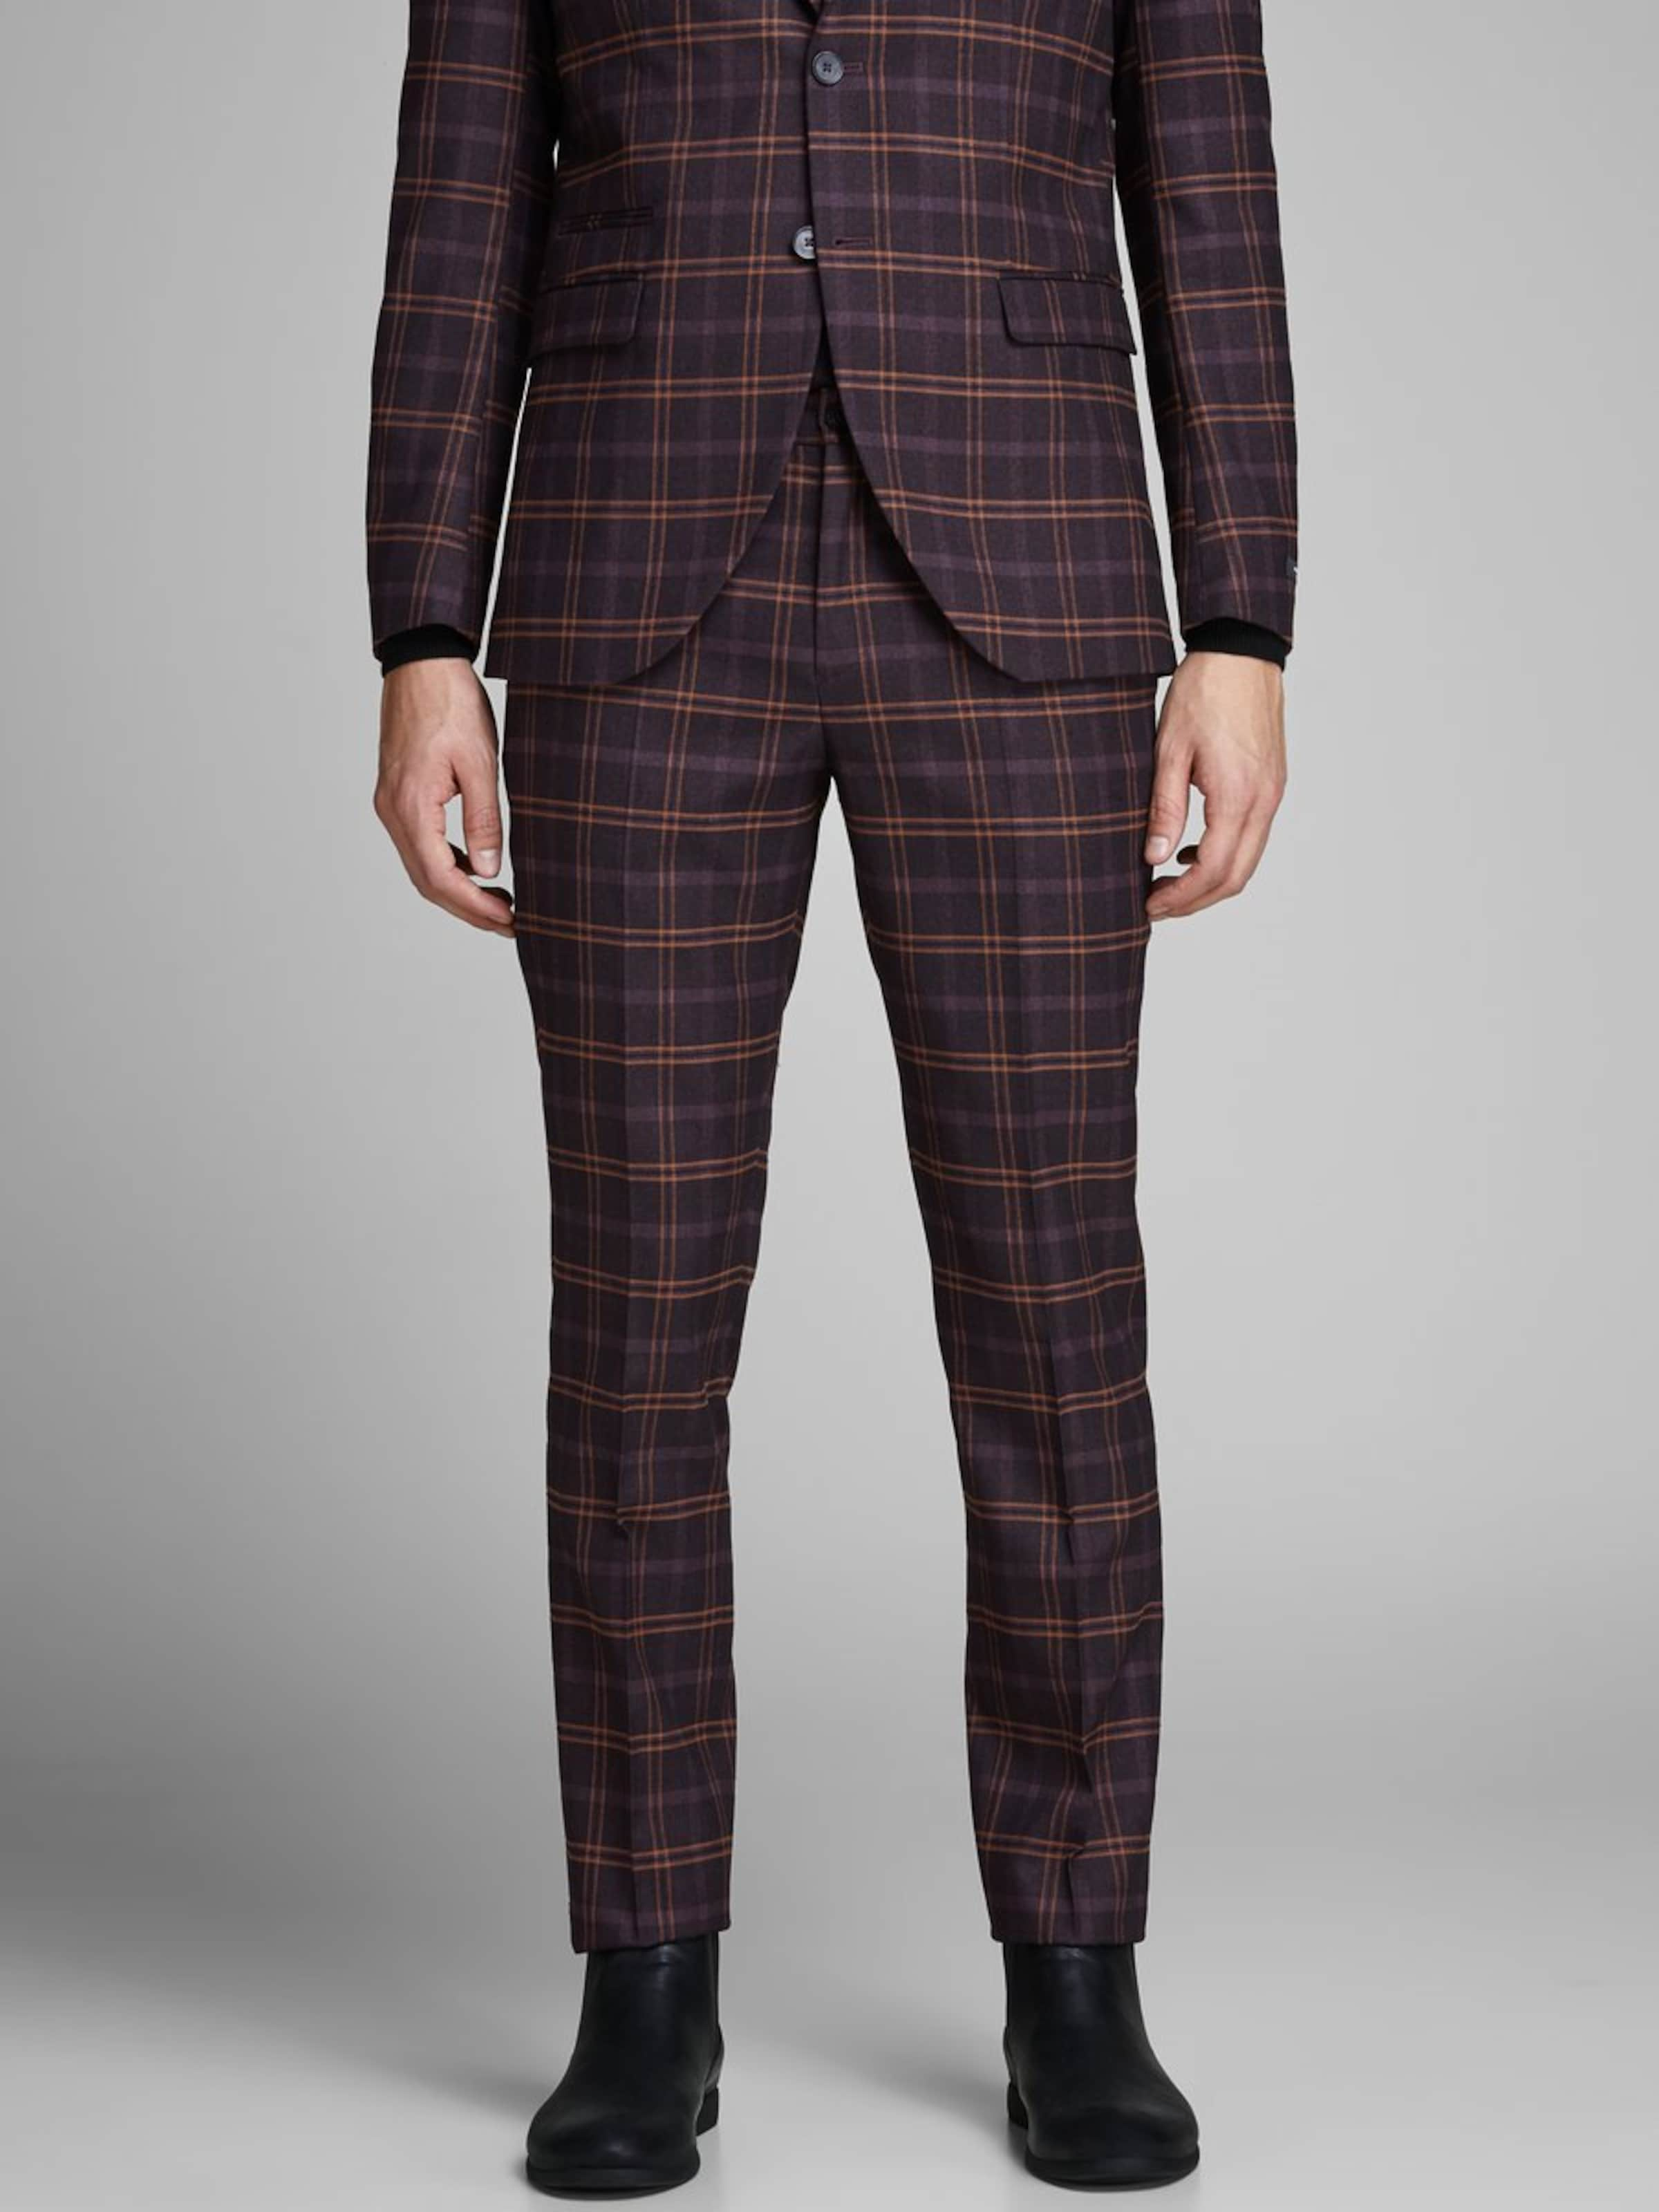 Jones Pantalon Jackamp; En OrangePourpre OrangePourpre Pantalon En Jones Jones Pantalon Jackamp; Jackamp; RL34qj5A